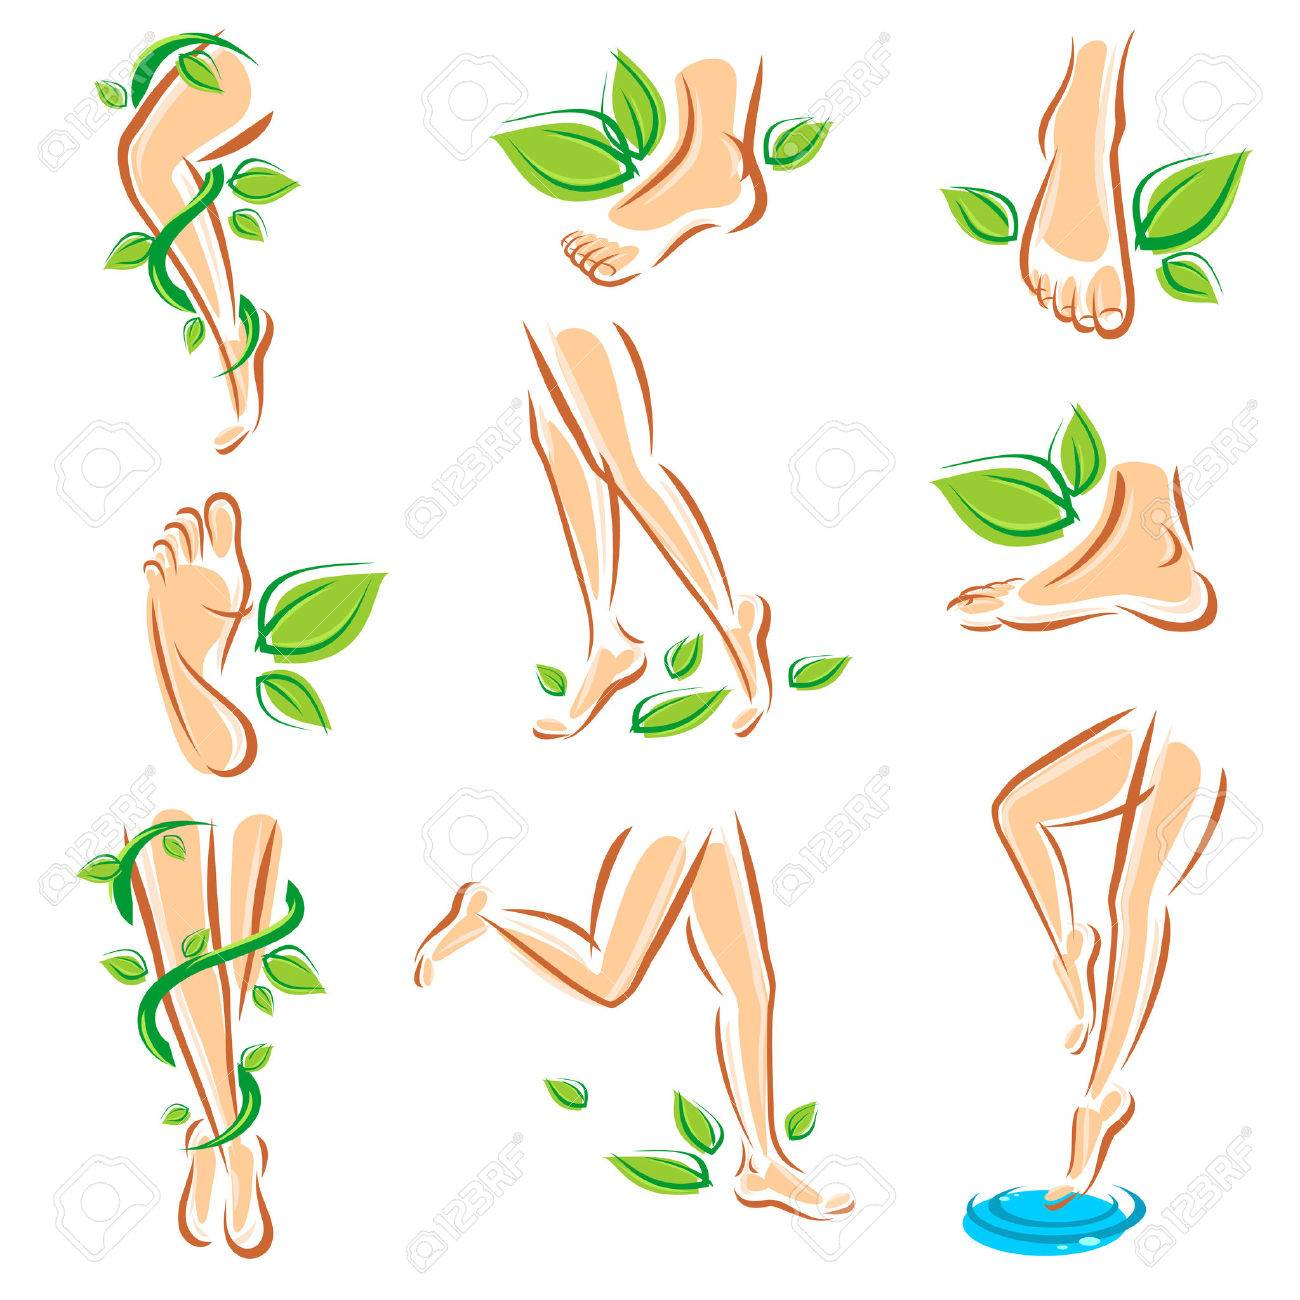 Healthy legs set Vector - 26056427